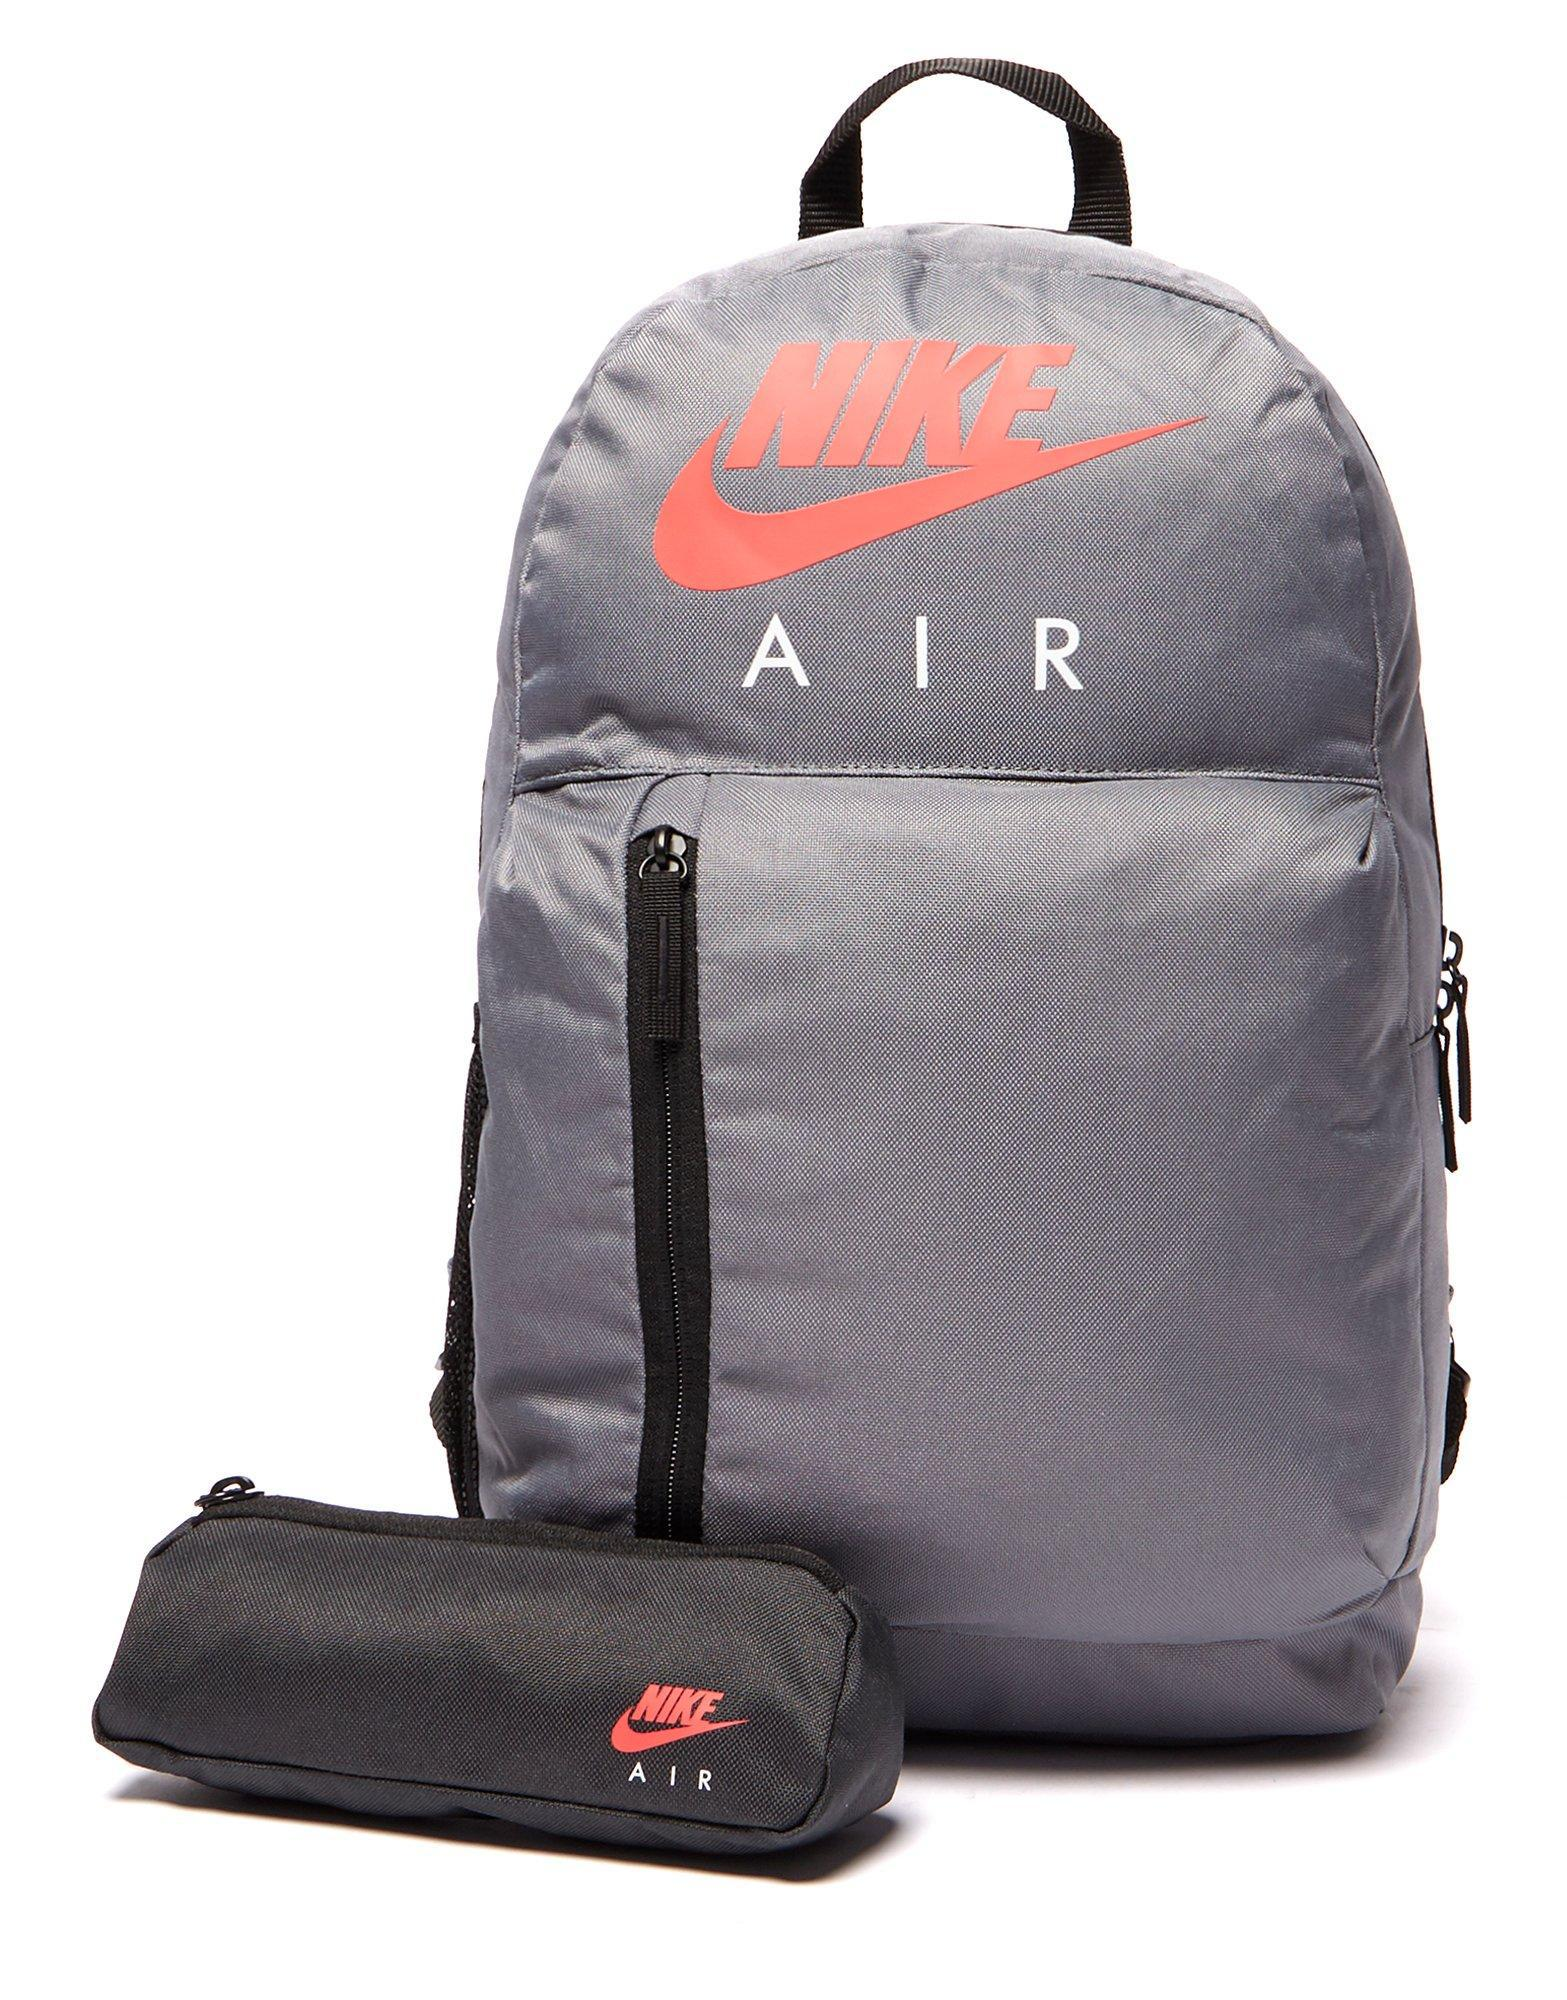 a342e33cf27 Nike Elemental Backpack in Gray for Men - Lyst